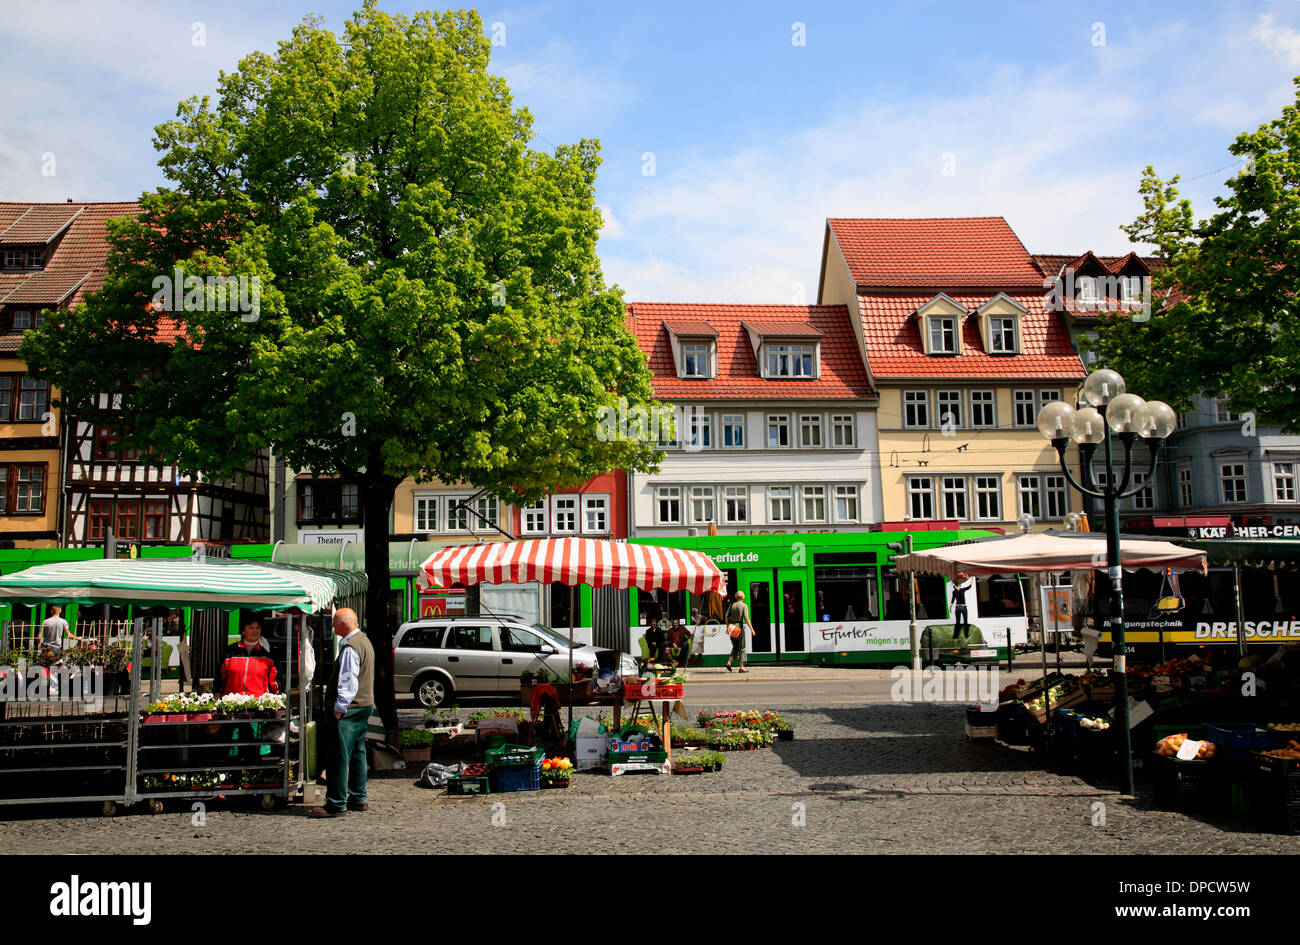 Markt am Domplatz, Domplatz, Erfurt, Thüringen, Deutschland, Europa Stockbild